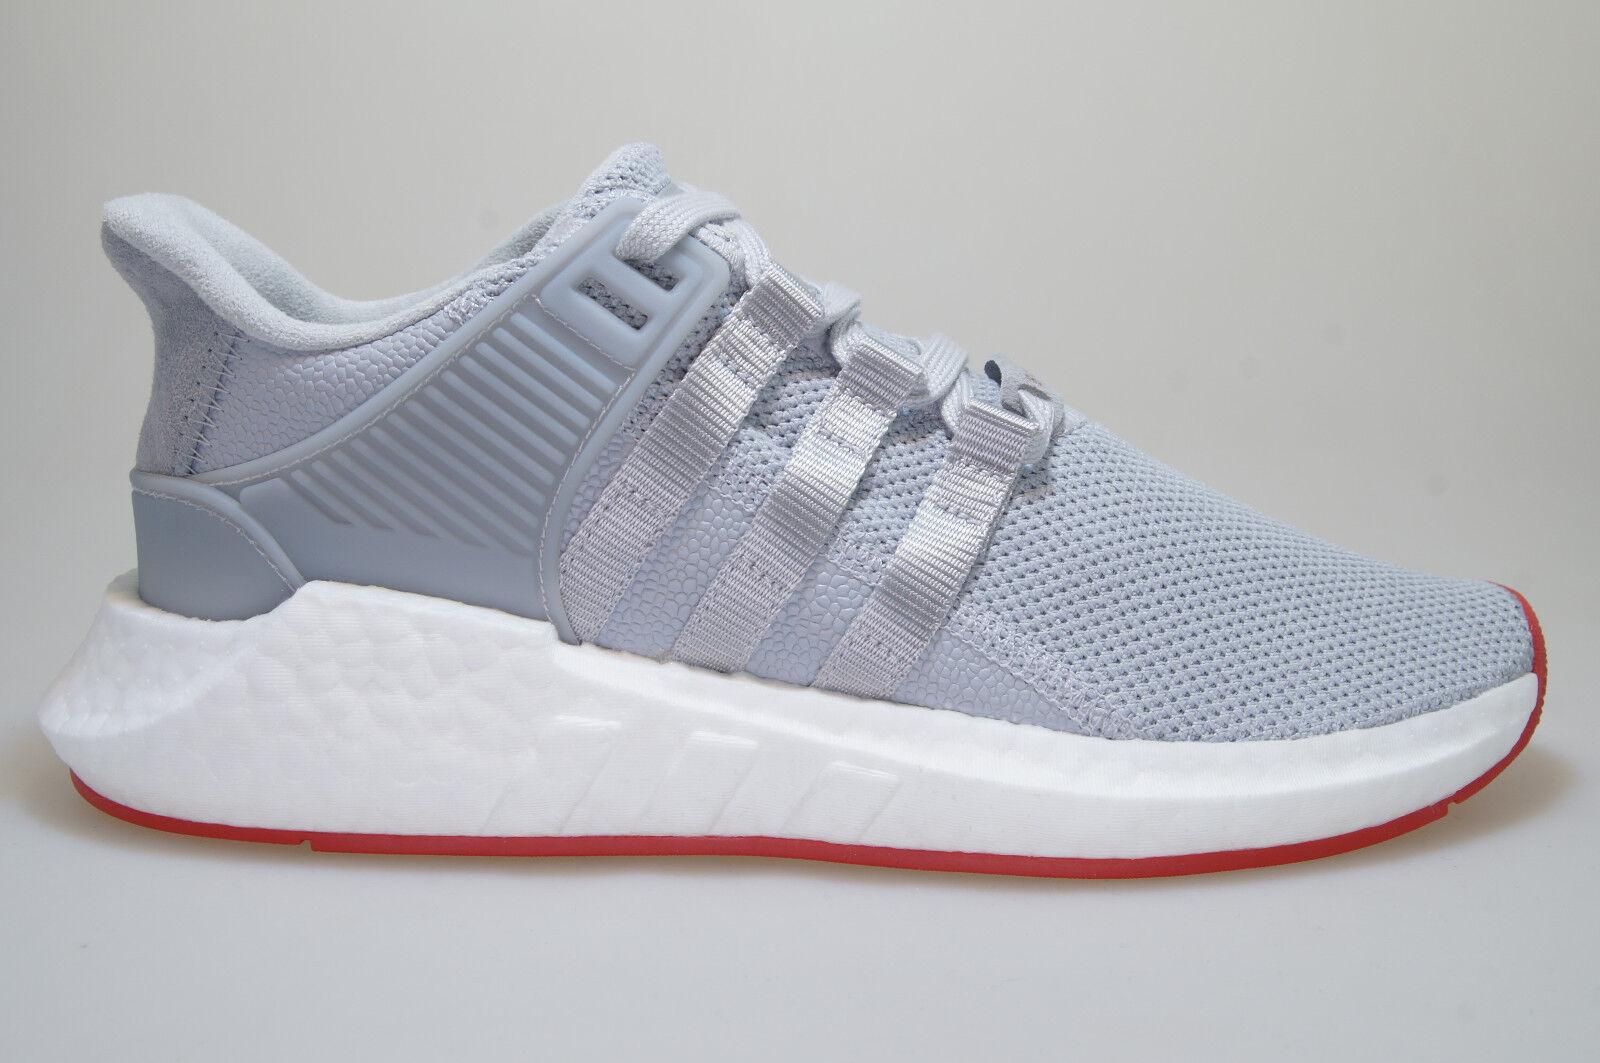 Adidas EQT Support 93/17 CQ2393 grau silber Equipment Sneaker Originals